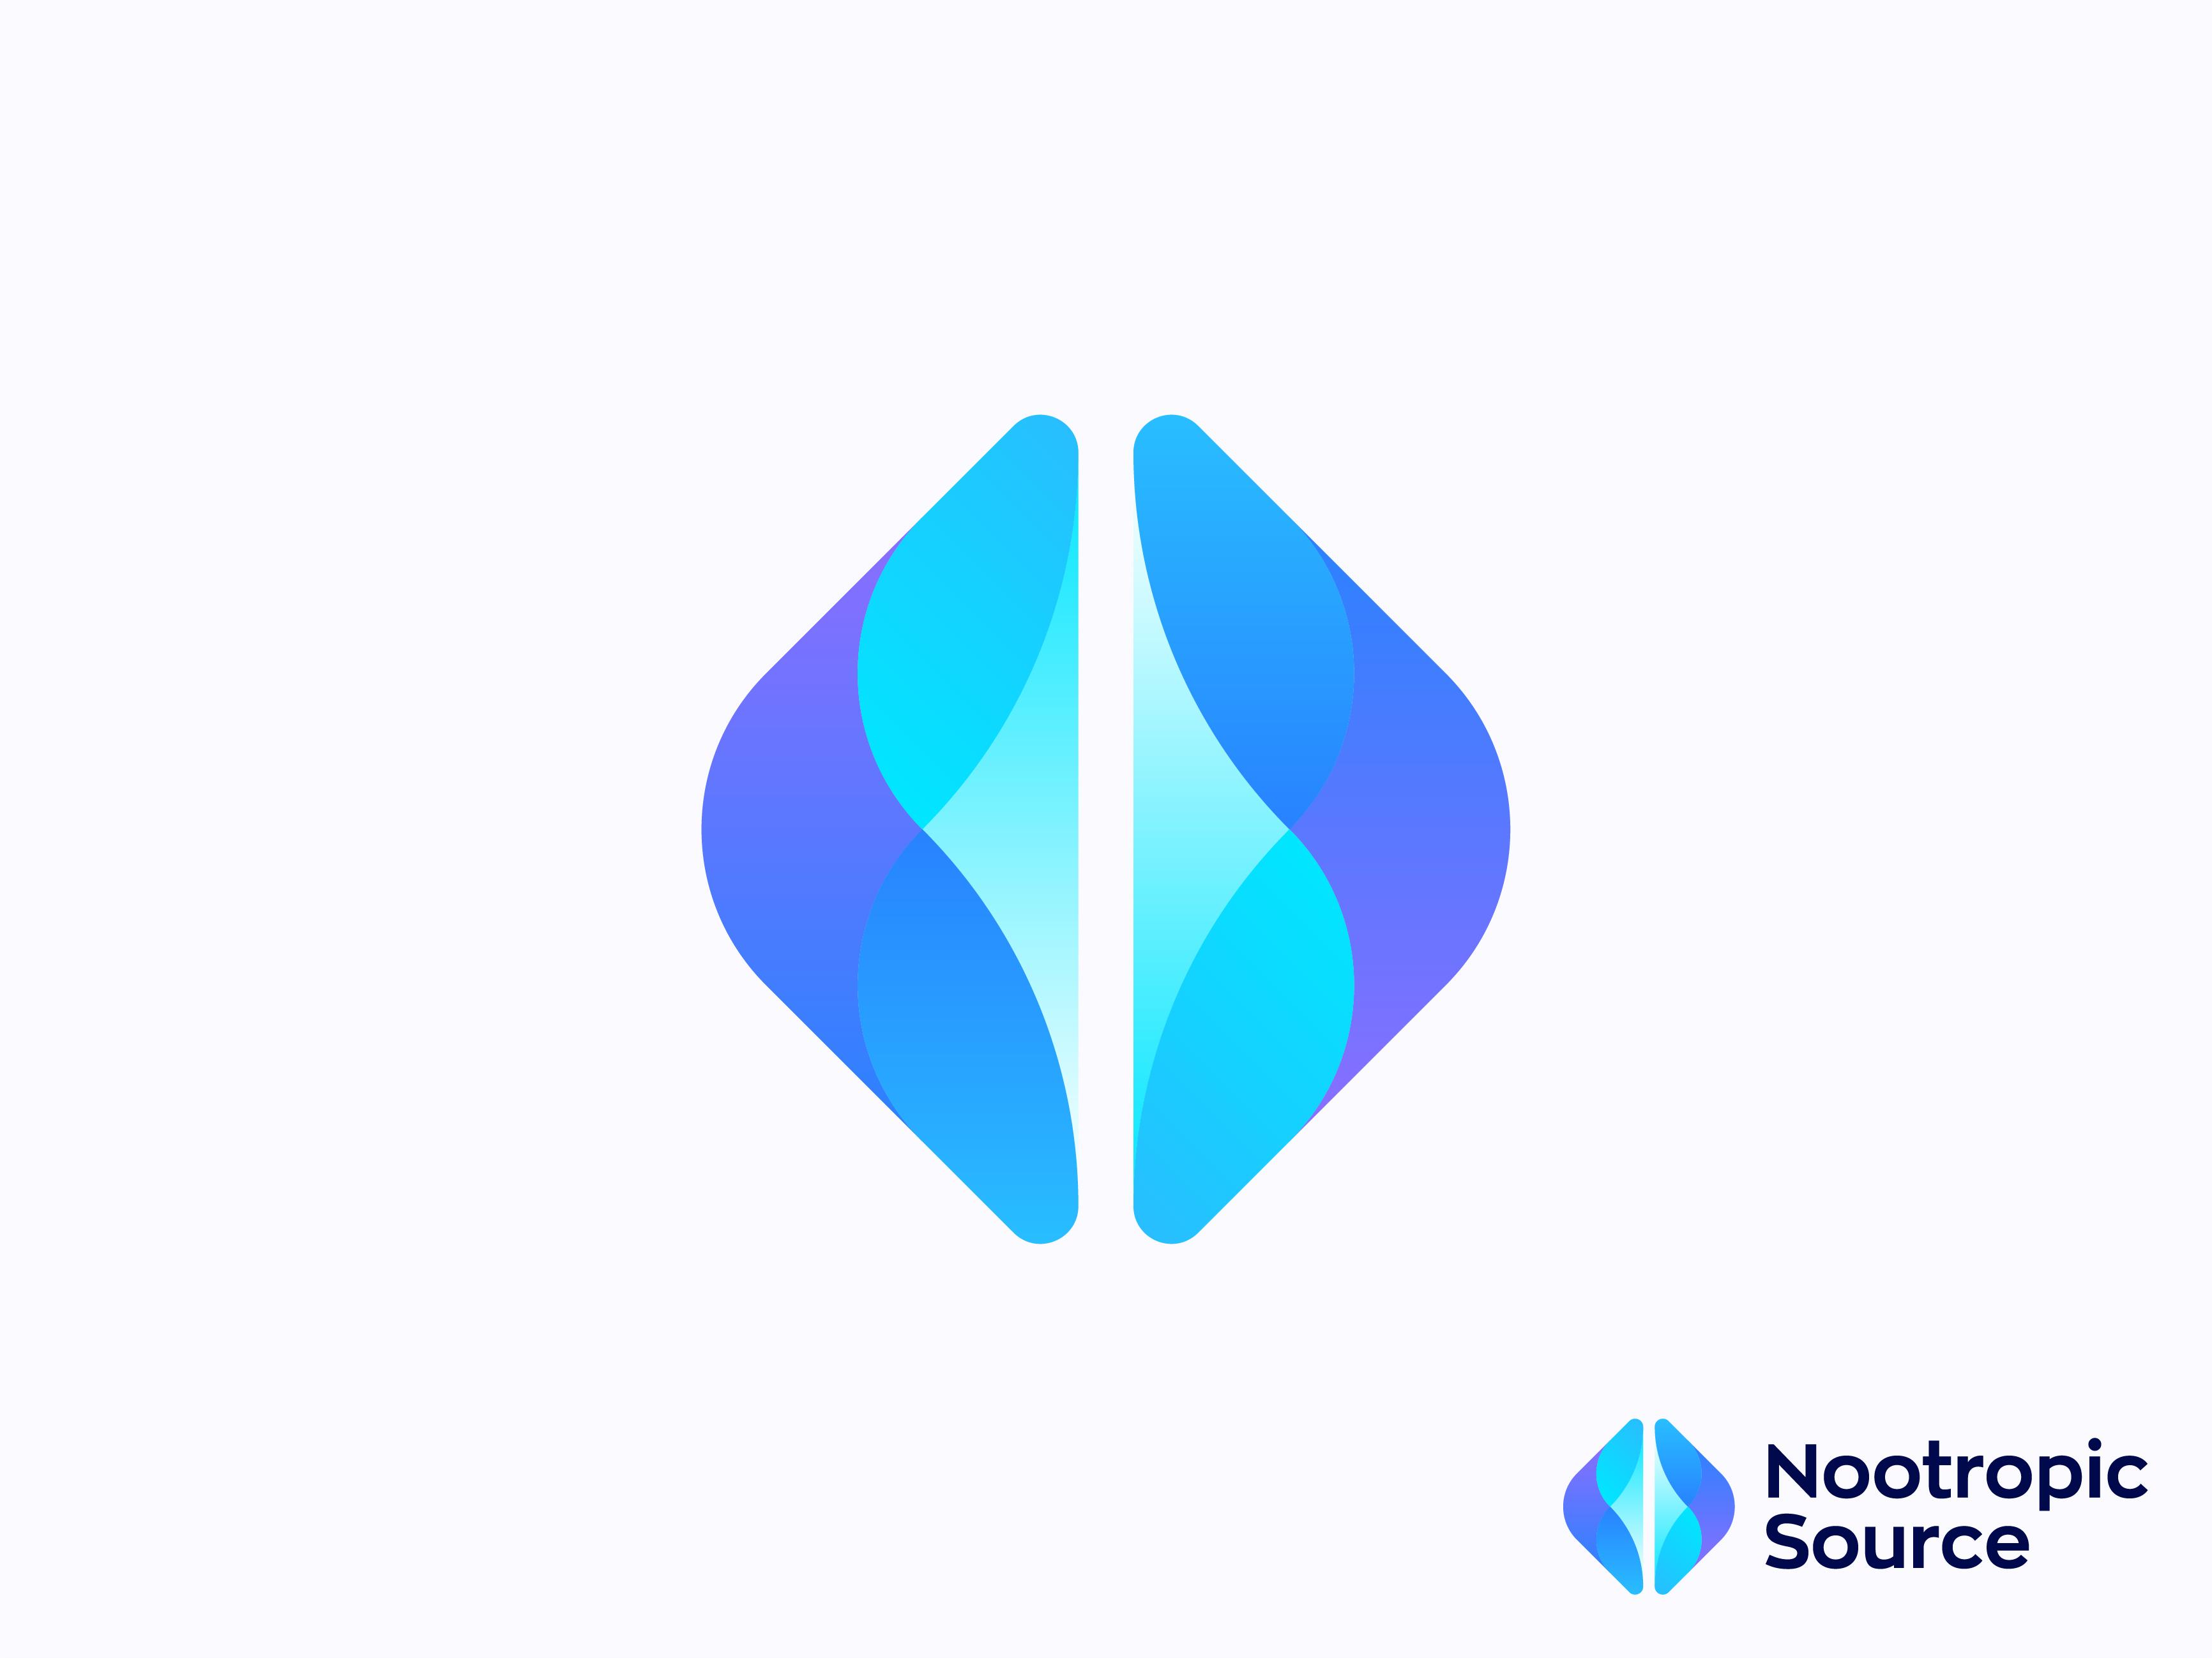 Nootropic Source Logo Design By Hristijan Eftimov Dribbble Dribbble